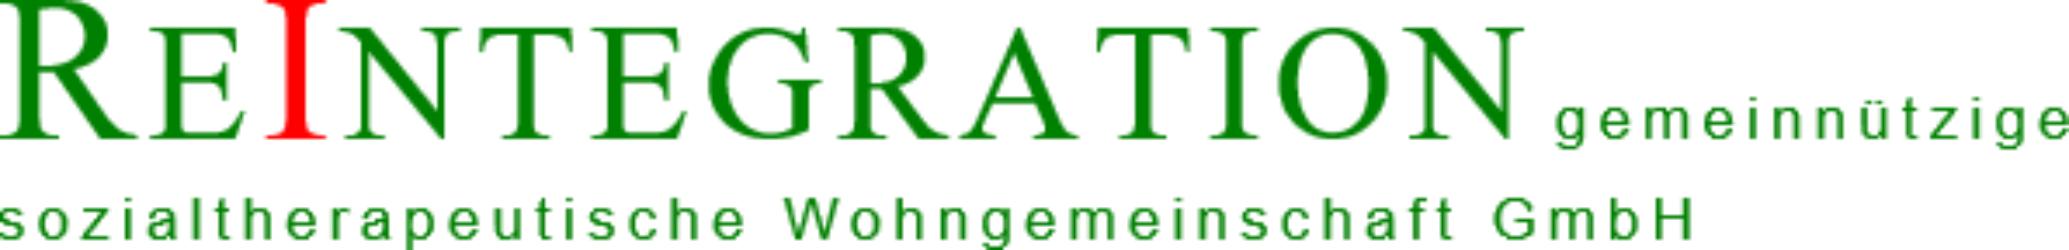 ReIntegration GmbH